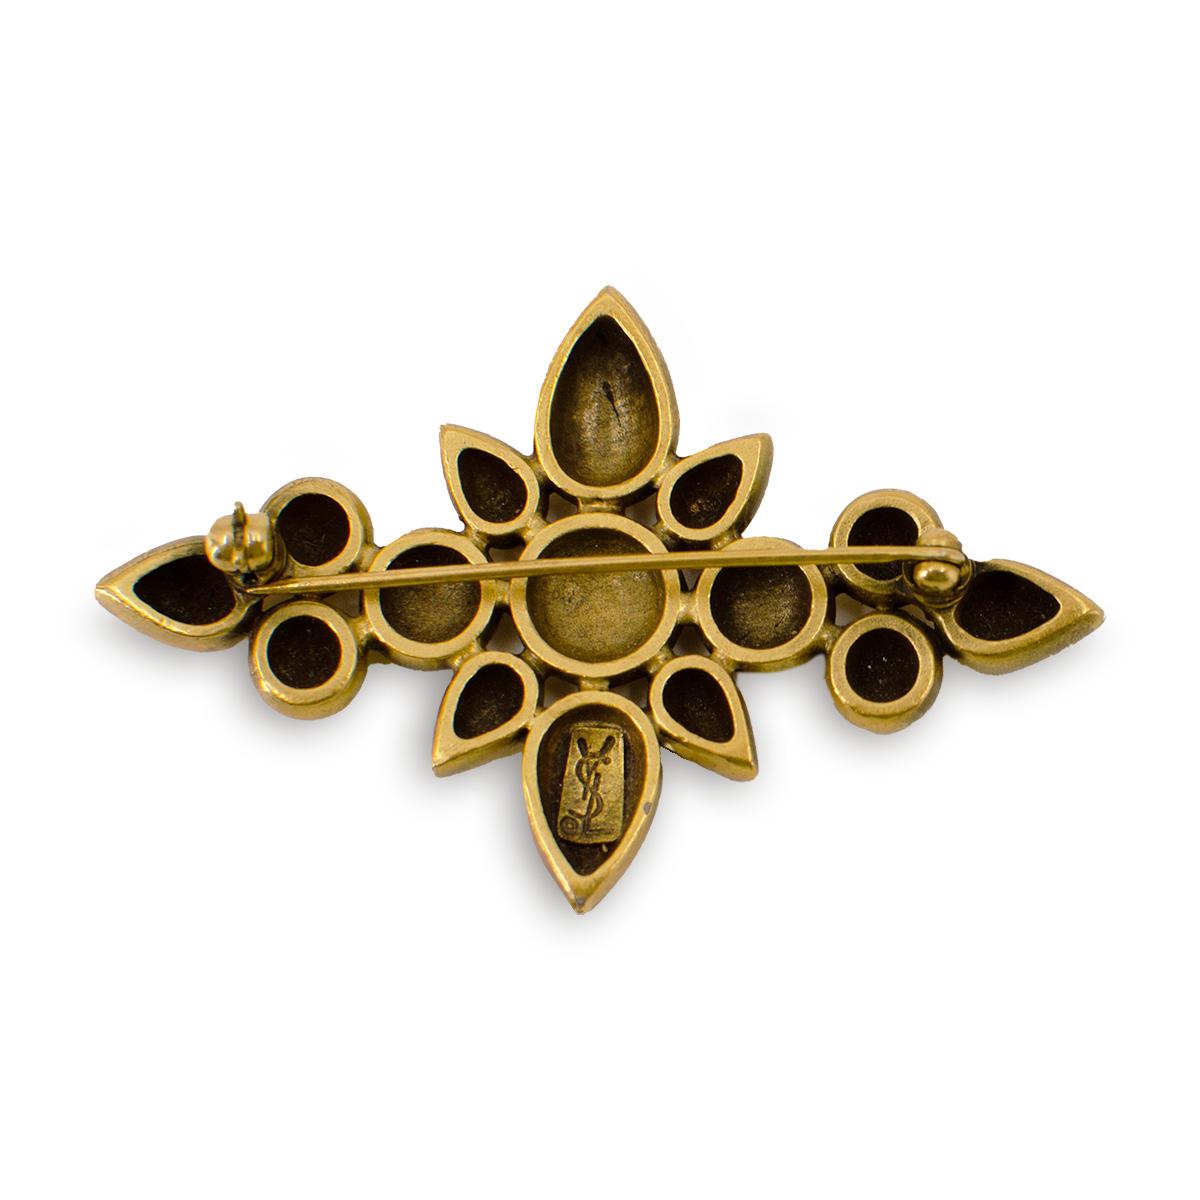 YLS gold brooch